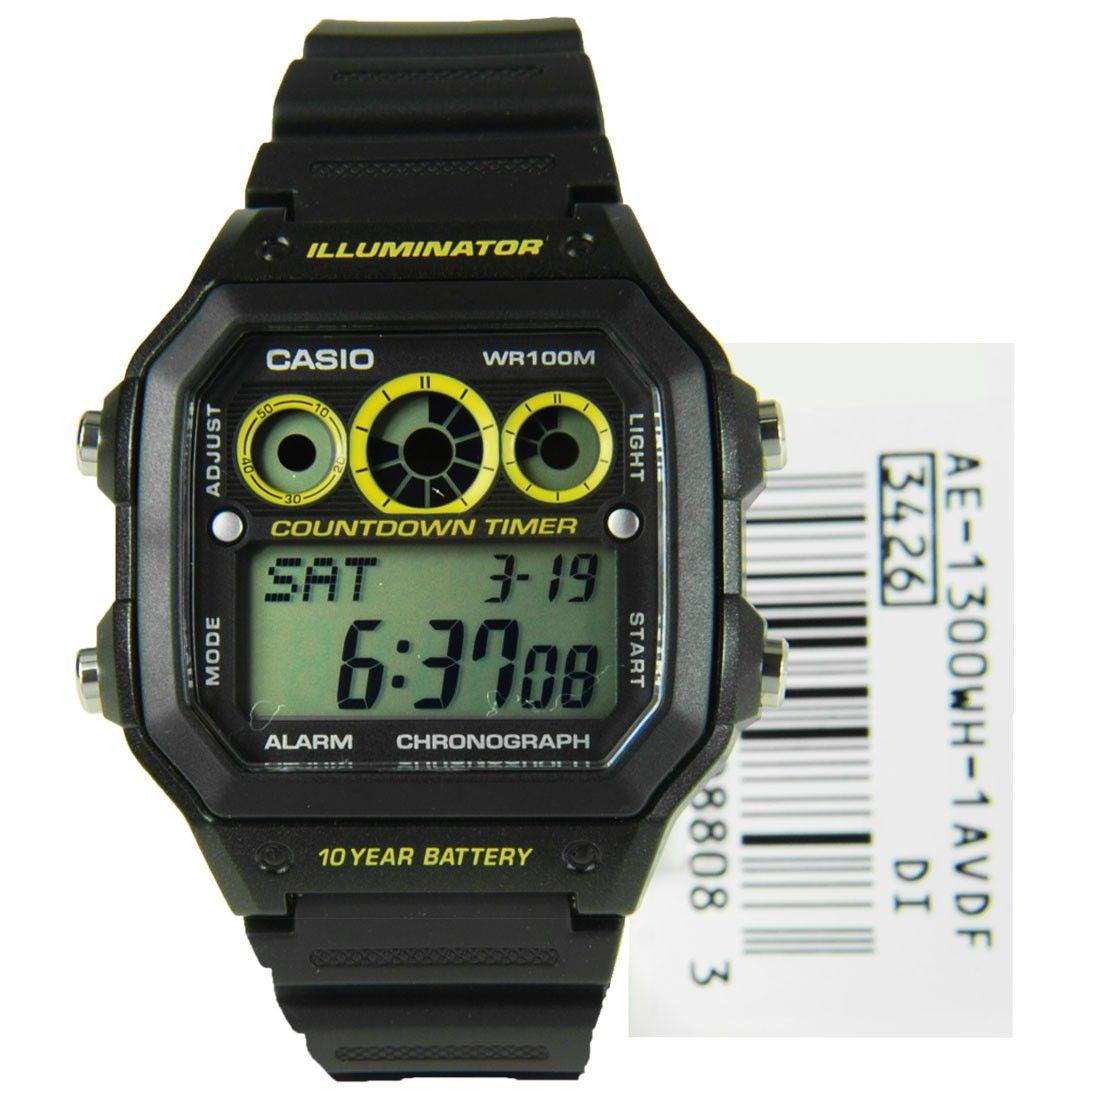 Casio Collection Black And Yellow Illuminator Chronograph Resin Watch Ae 1300wh 1a Ae 1300wh Casio Black N Yellow Illuminator